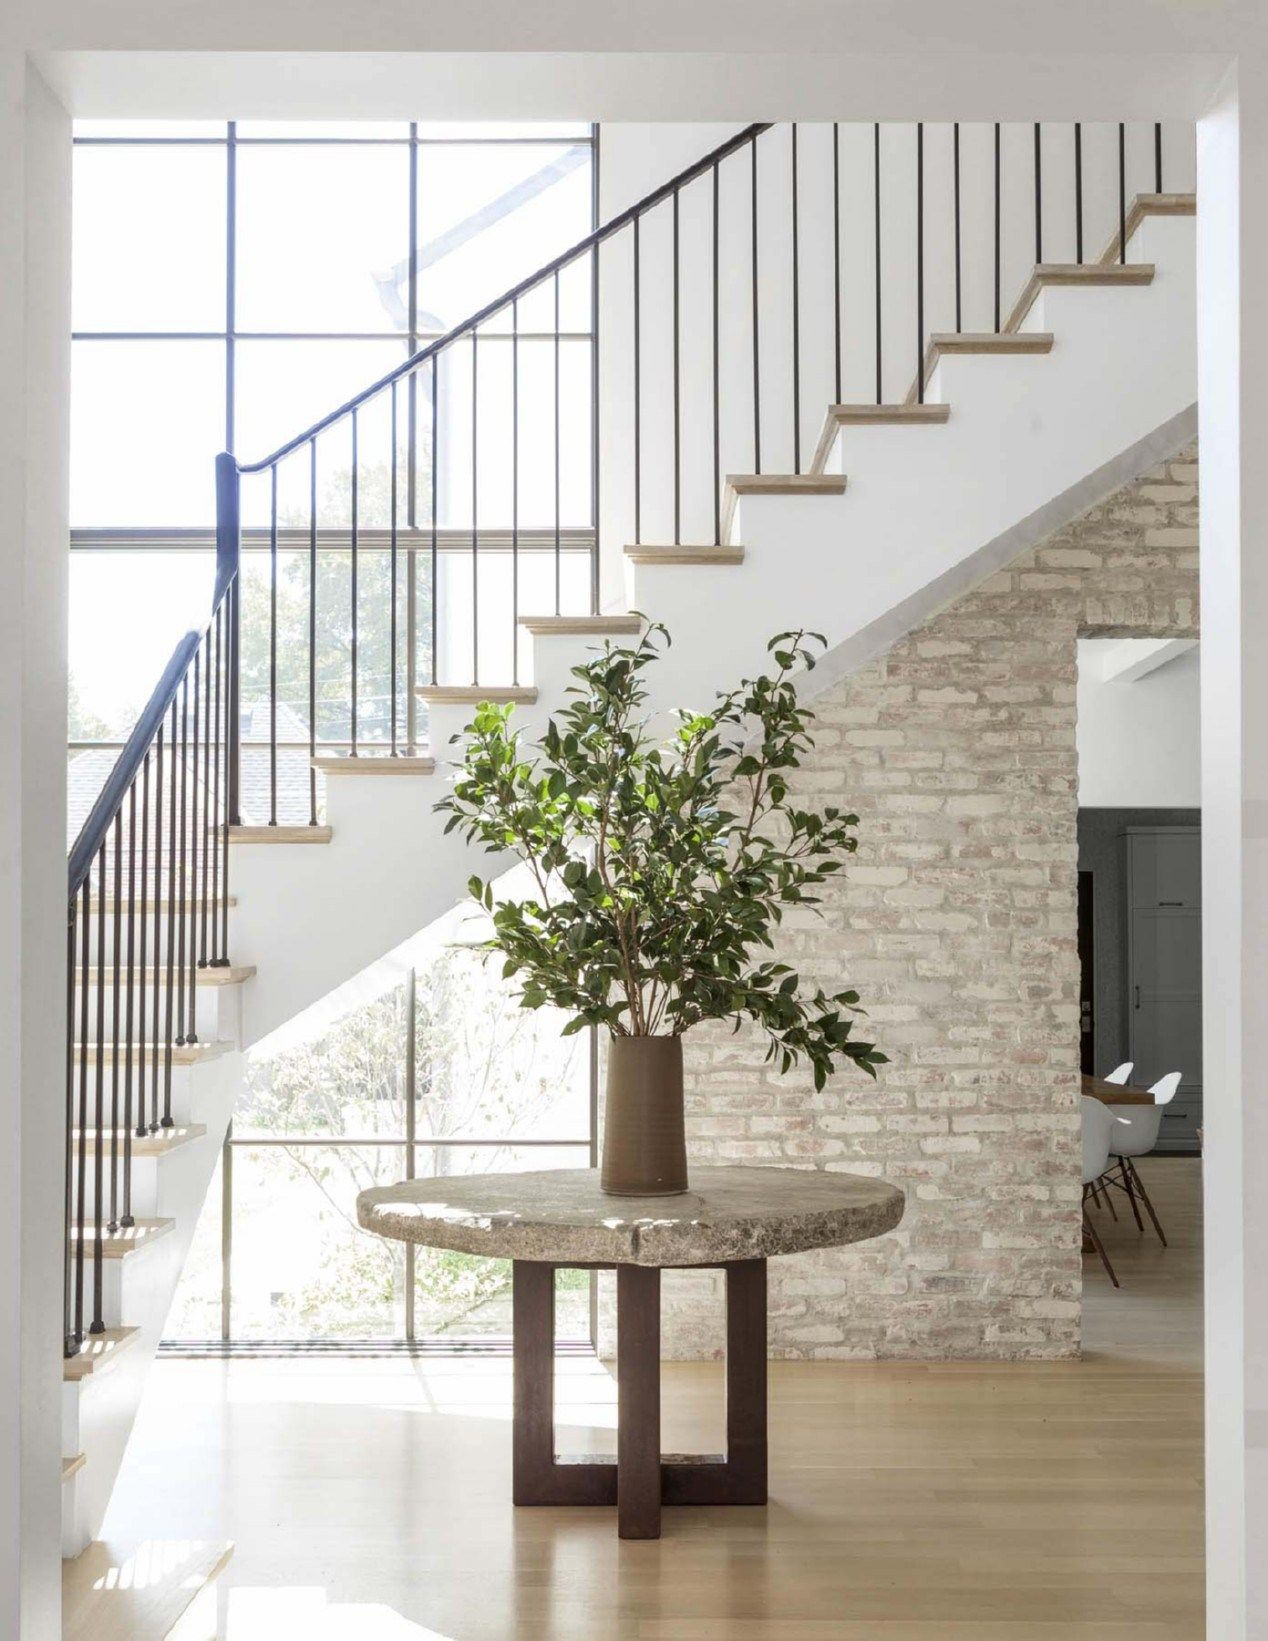 Awesome modern mediterranean homes interior design ideas (34) | New ...